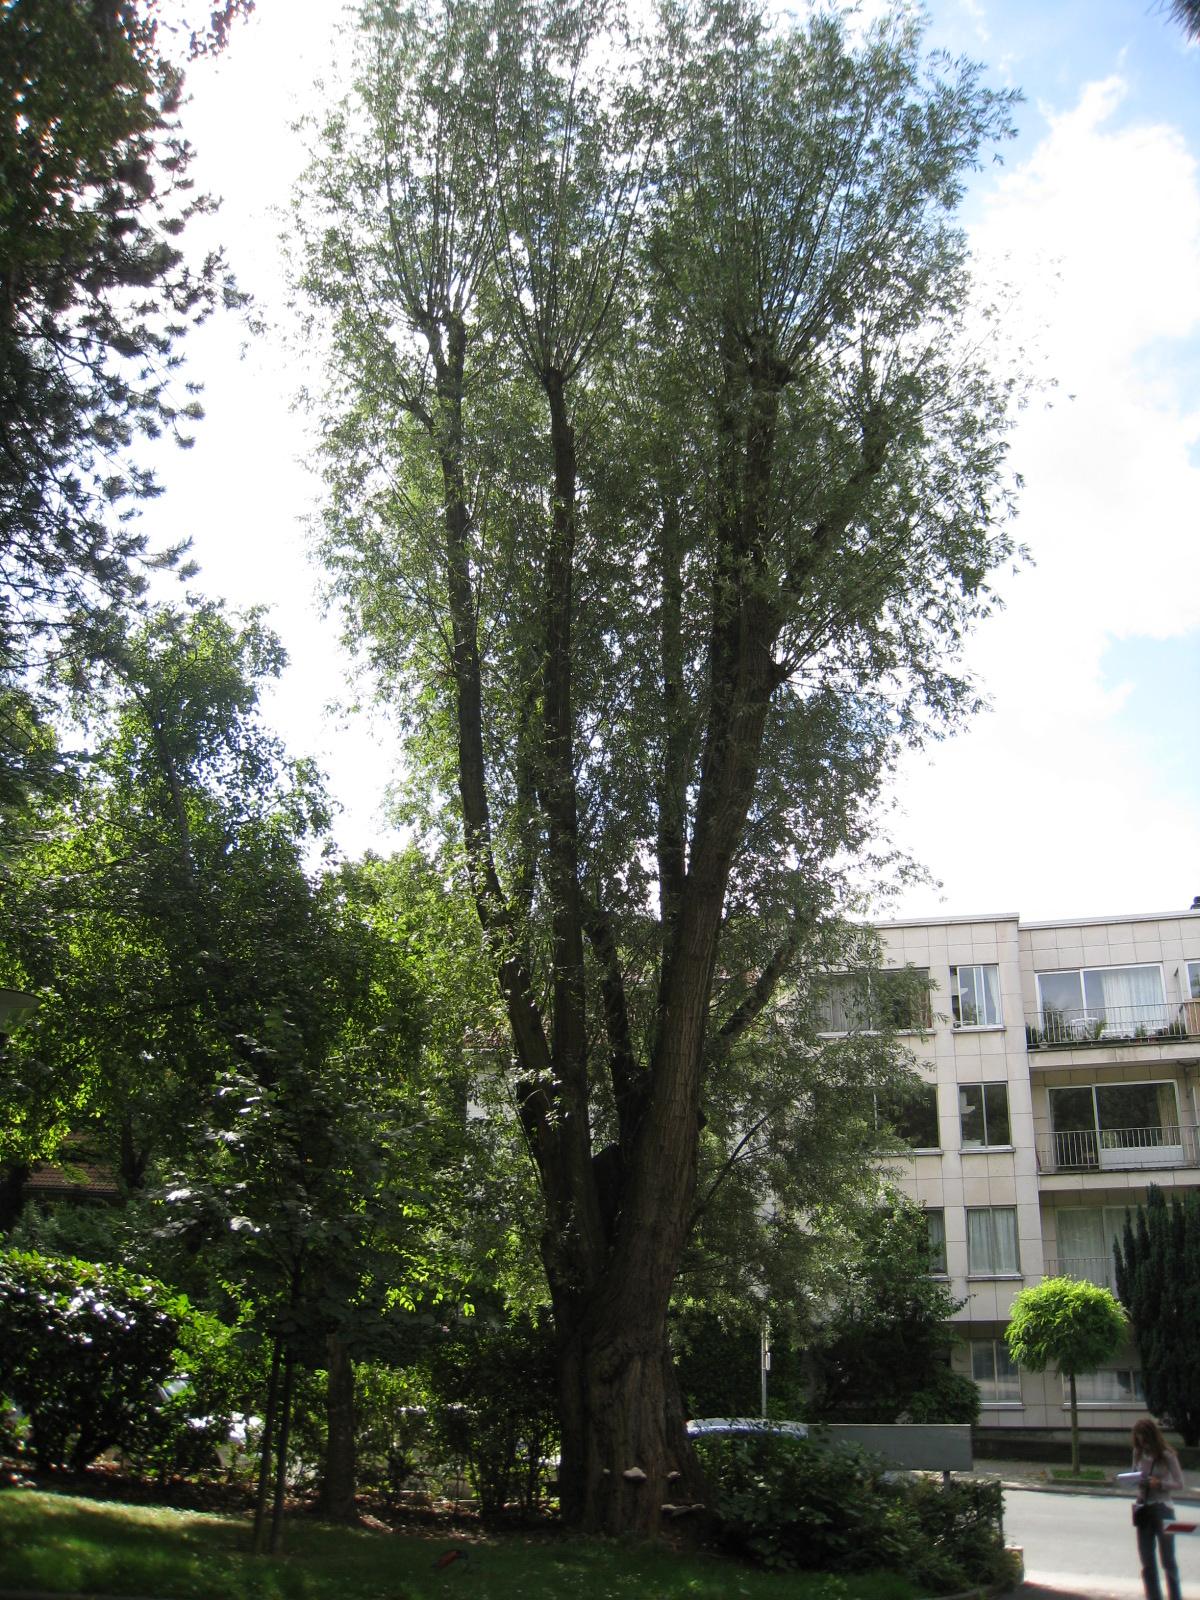 Gewone wilg – Ukkel, Montjoielaan, 171 –  01 Januari 1995